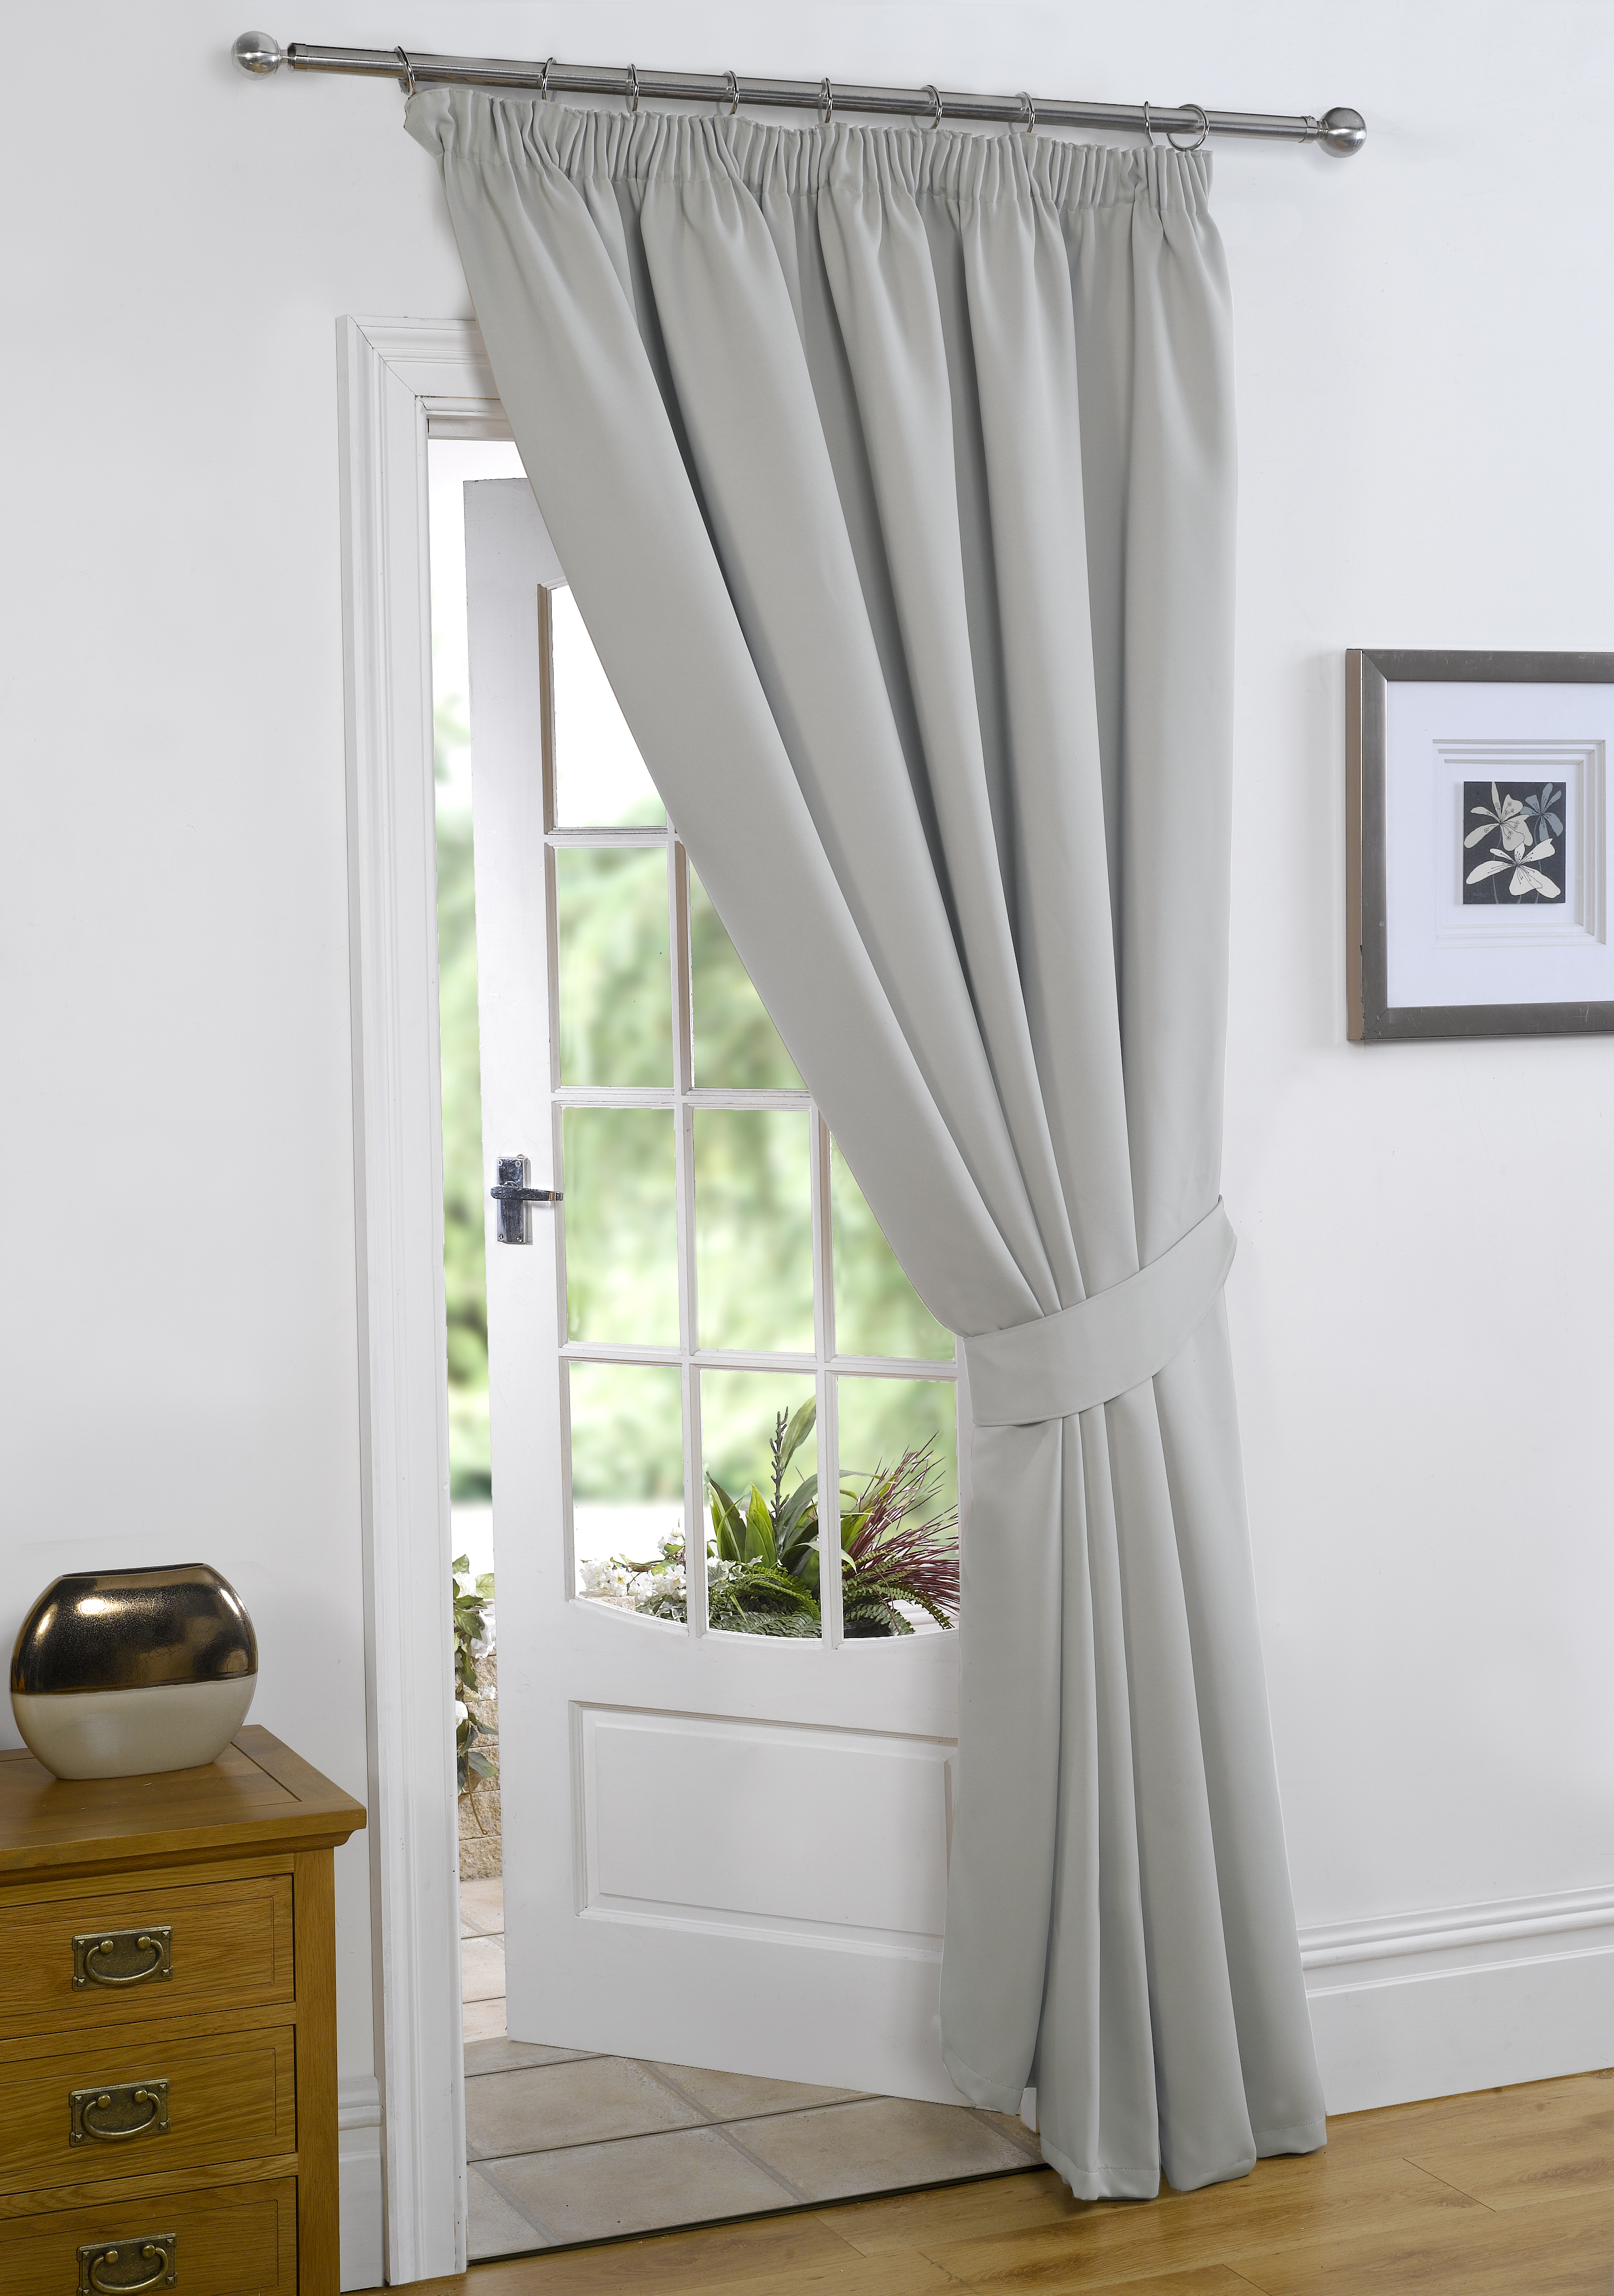 embrasse pour rideau fashion designs. Black Bedroom Furniture Sets. Home Design Ideas